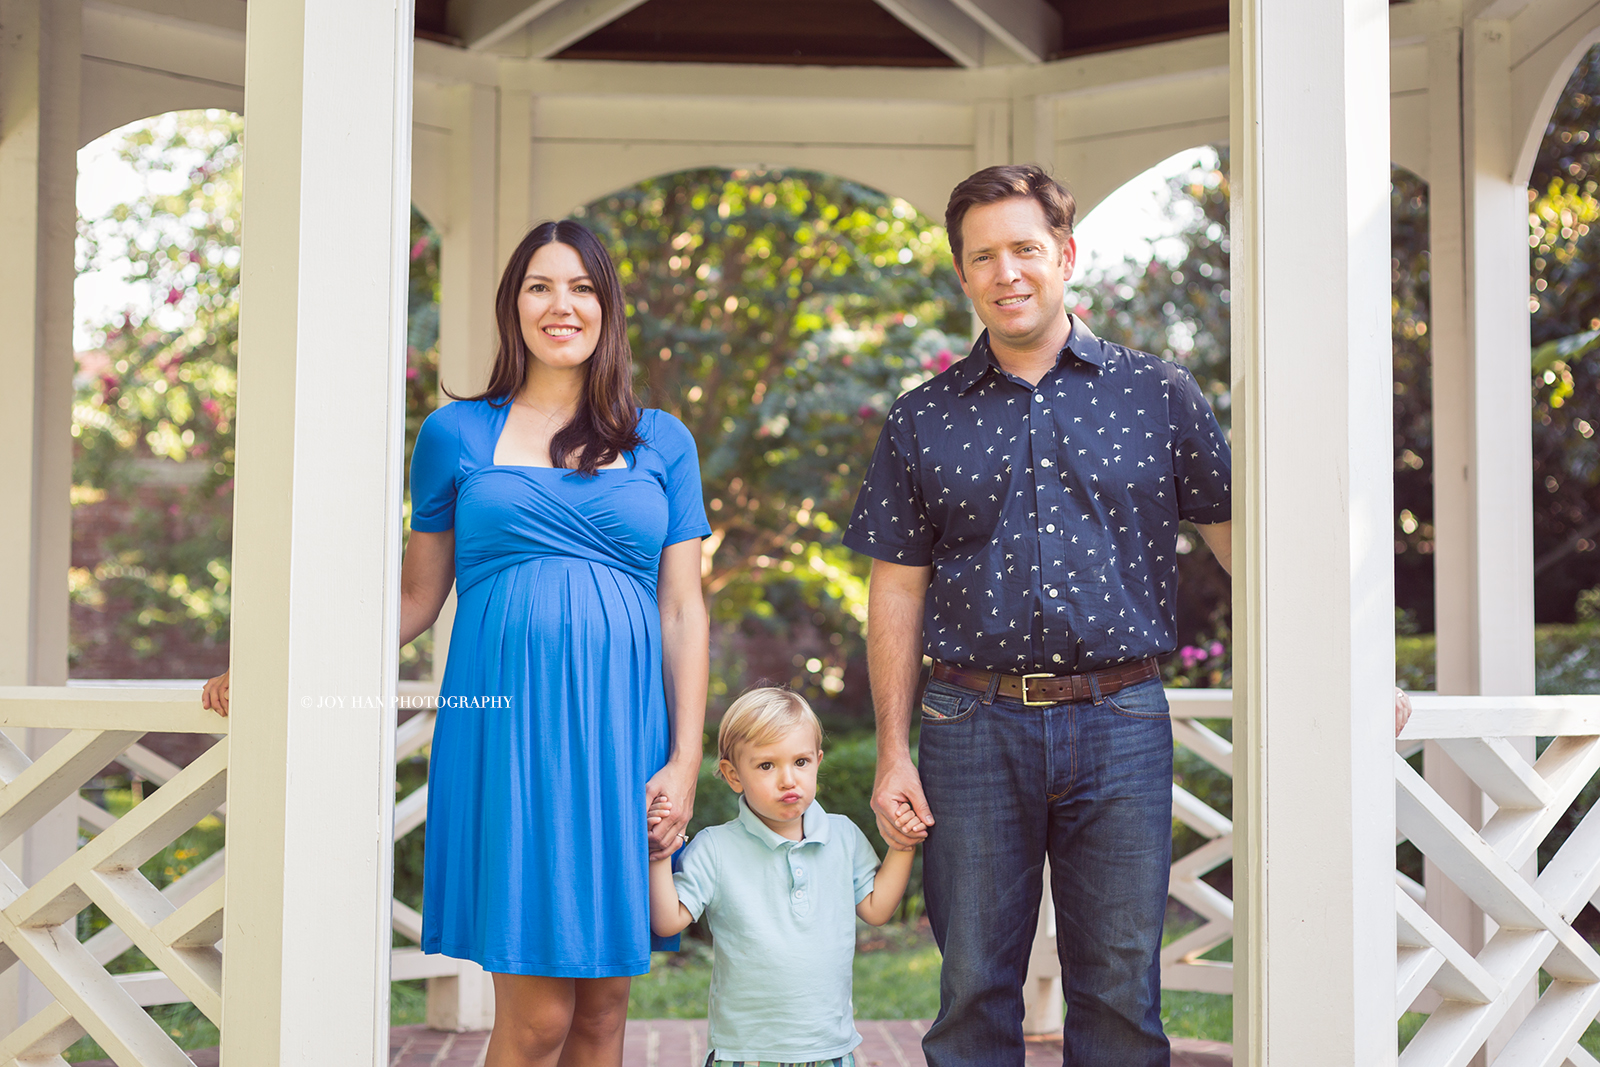 Best Family Photographer in Northern VA